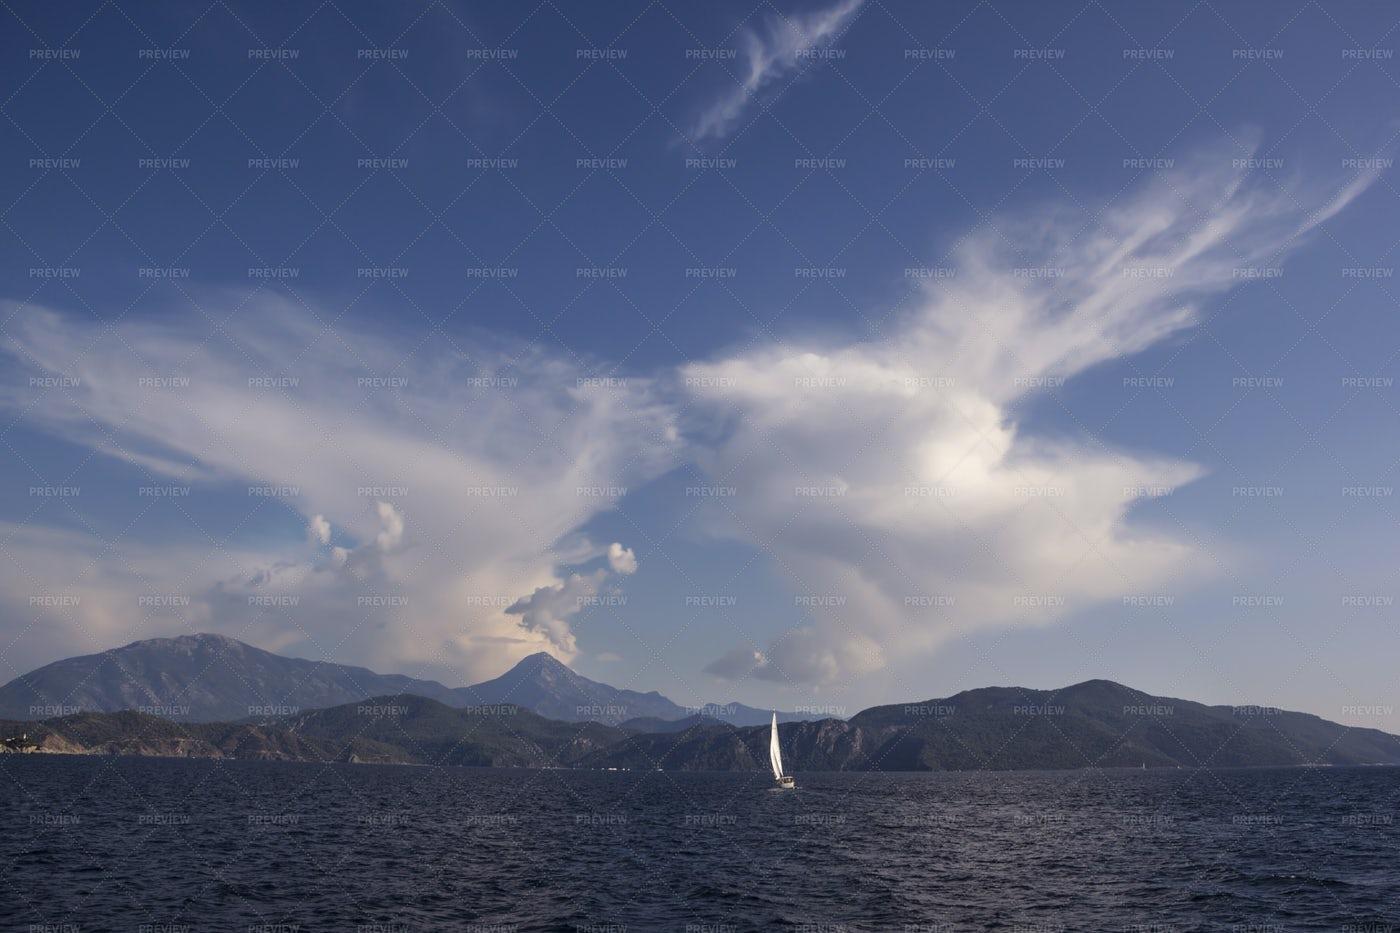 Yacht Sails At Sea: Stock Photos